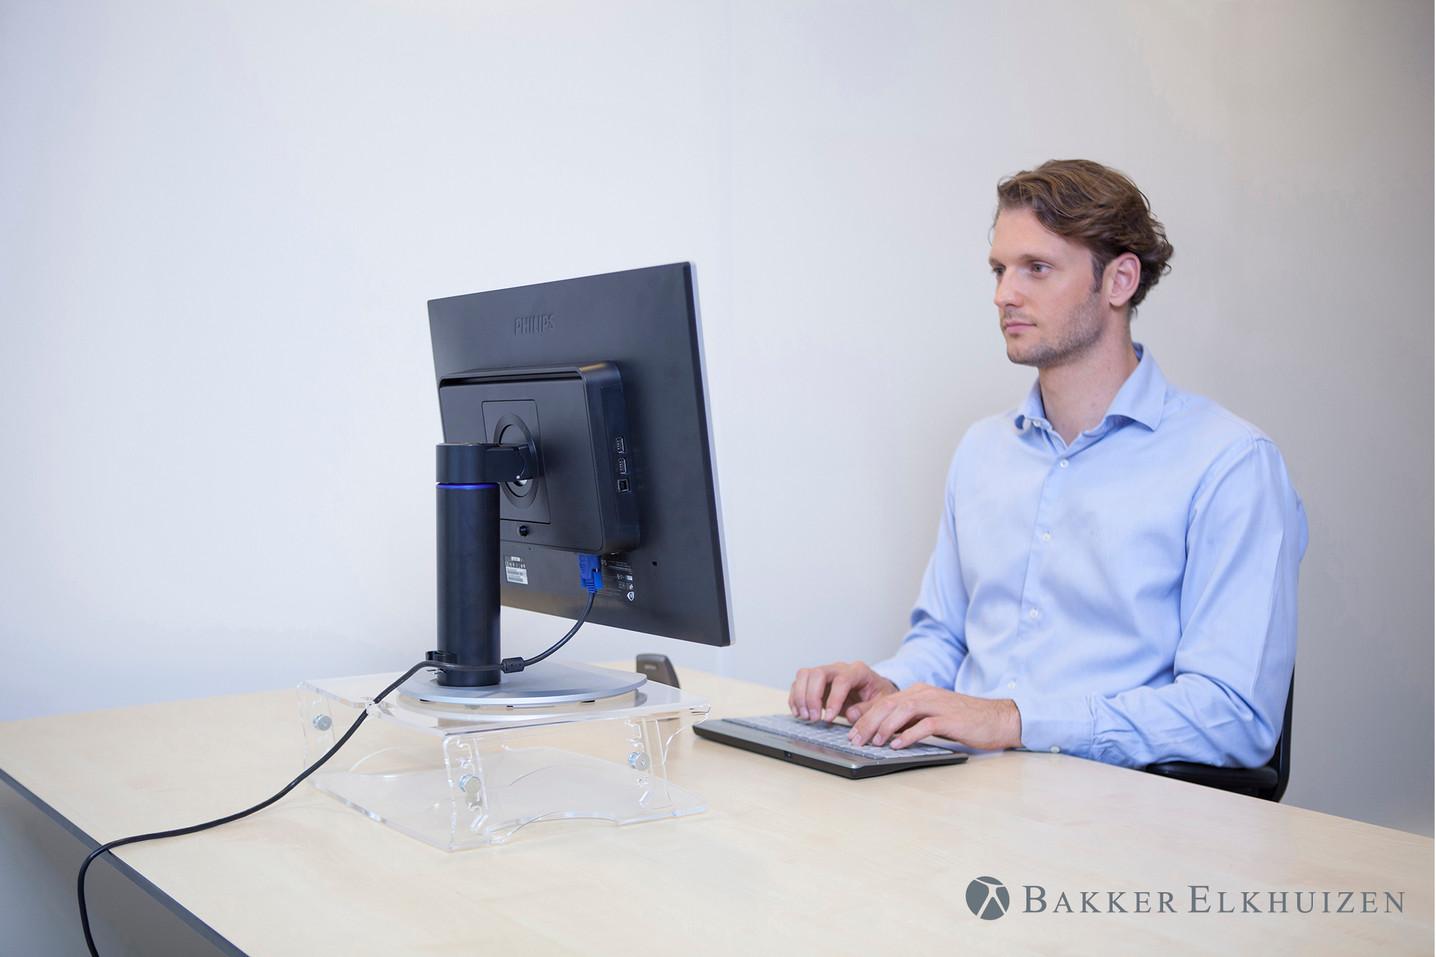 q-riser-140-monitor-stand-1534761168.jpg